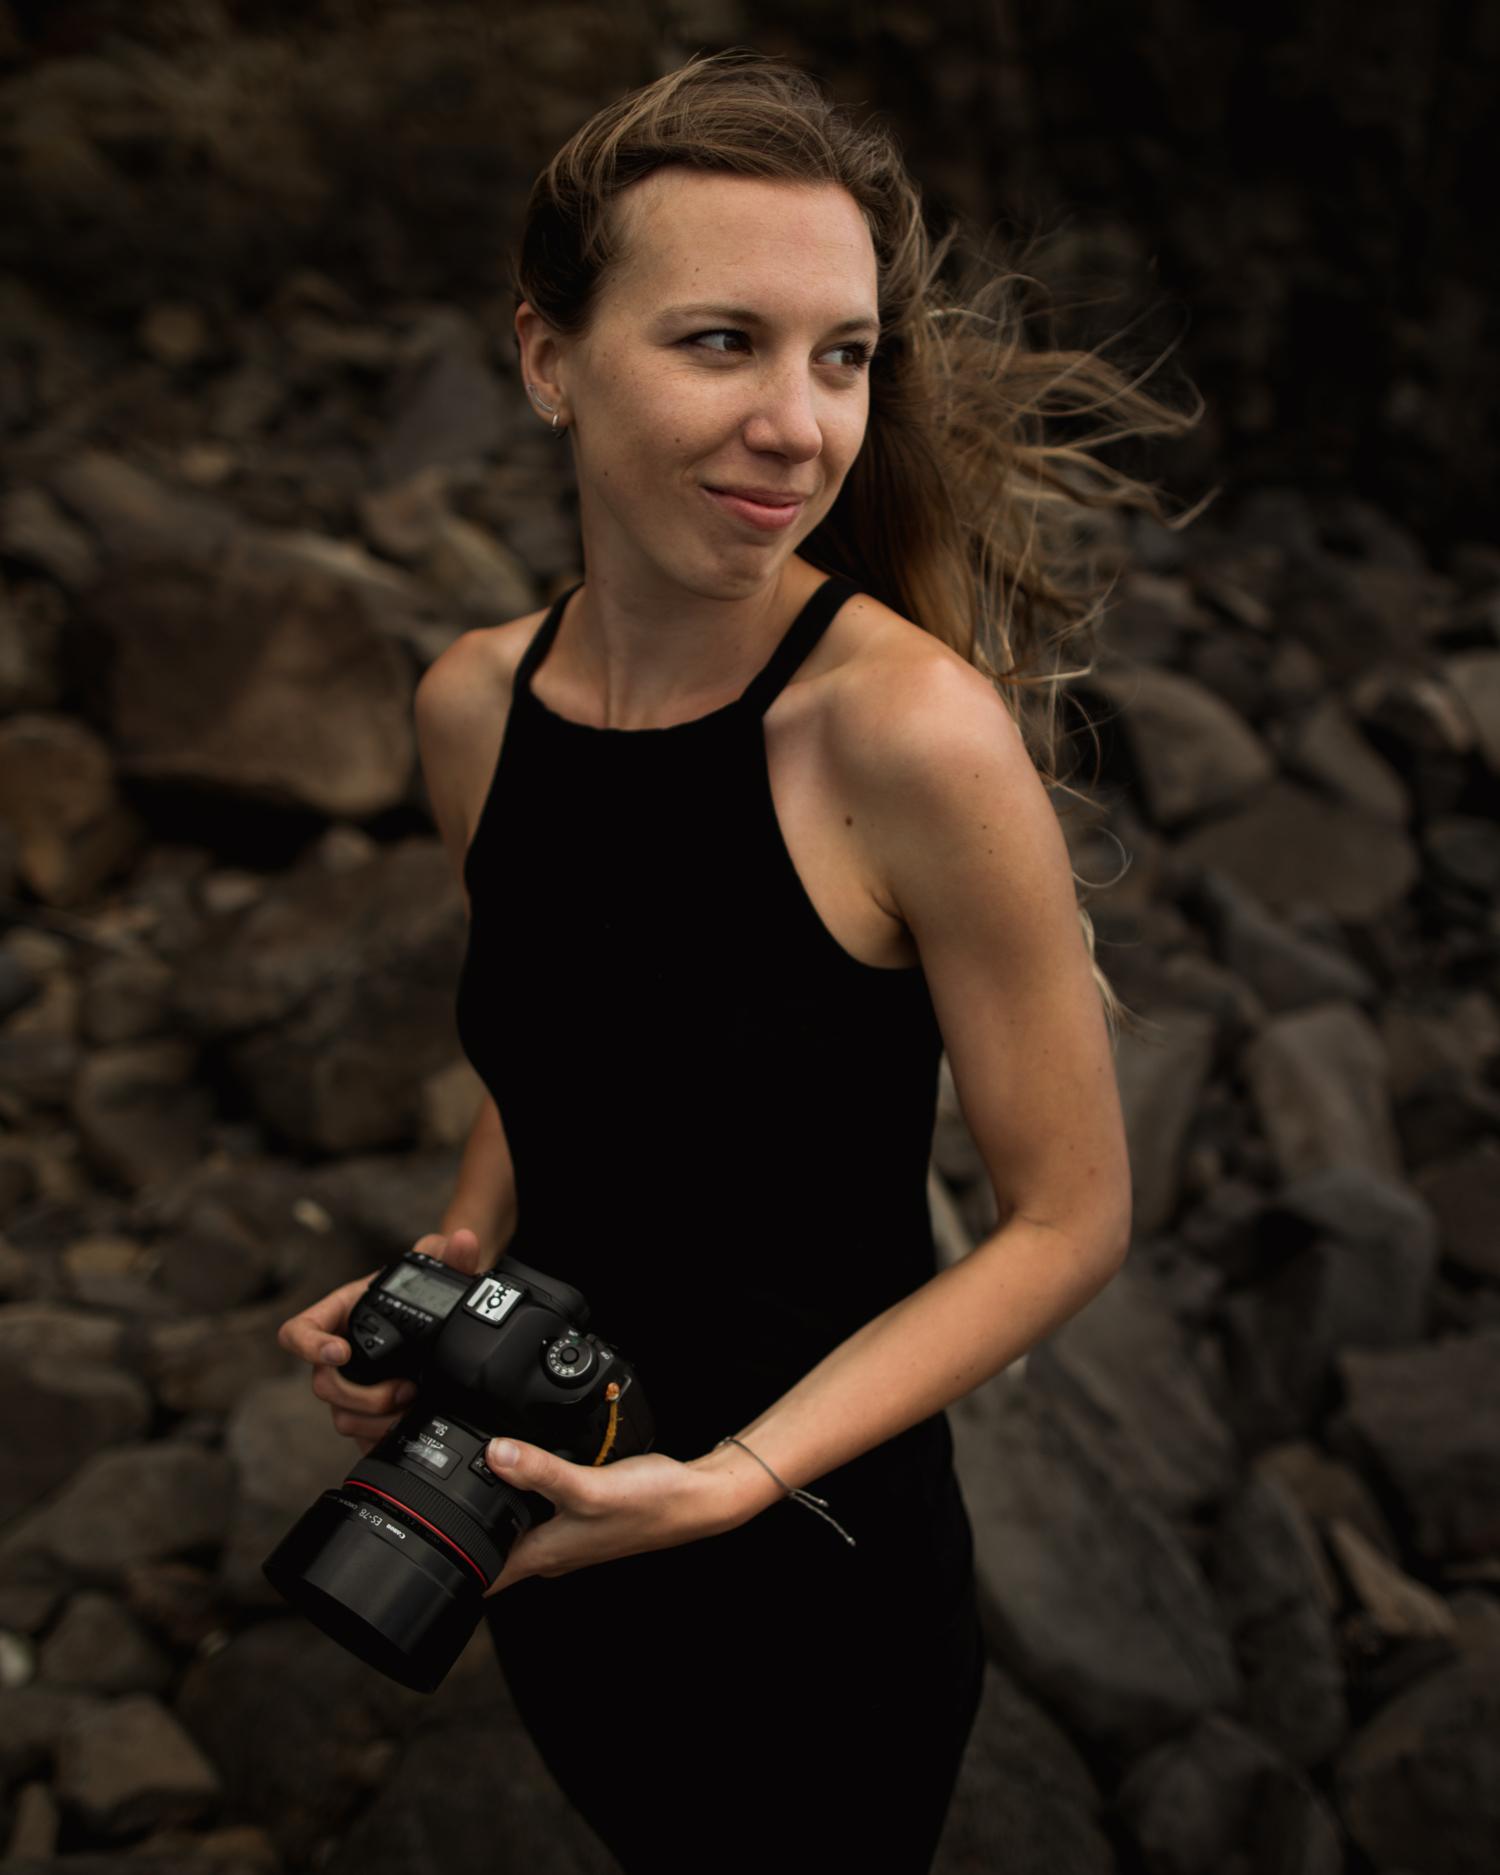 adventure-wedding-photographer-Bec-Kilpatrick